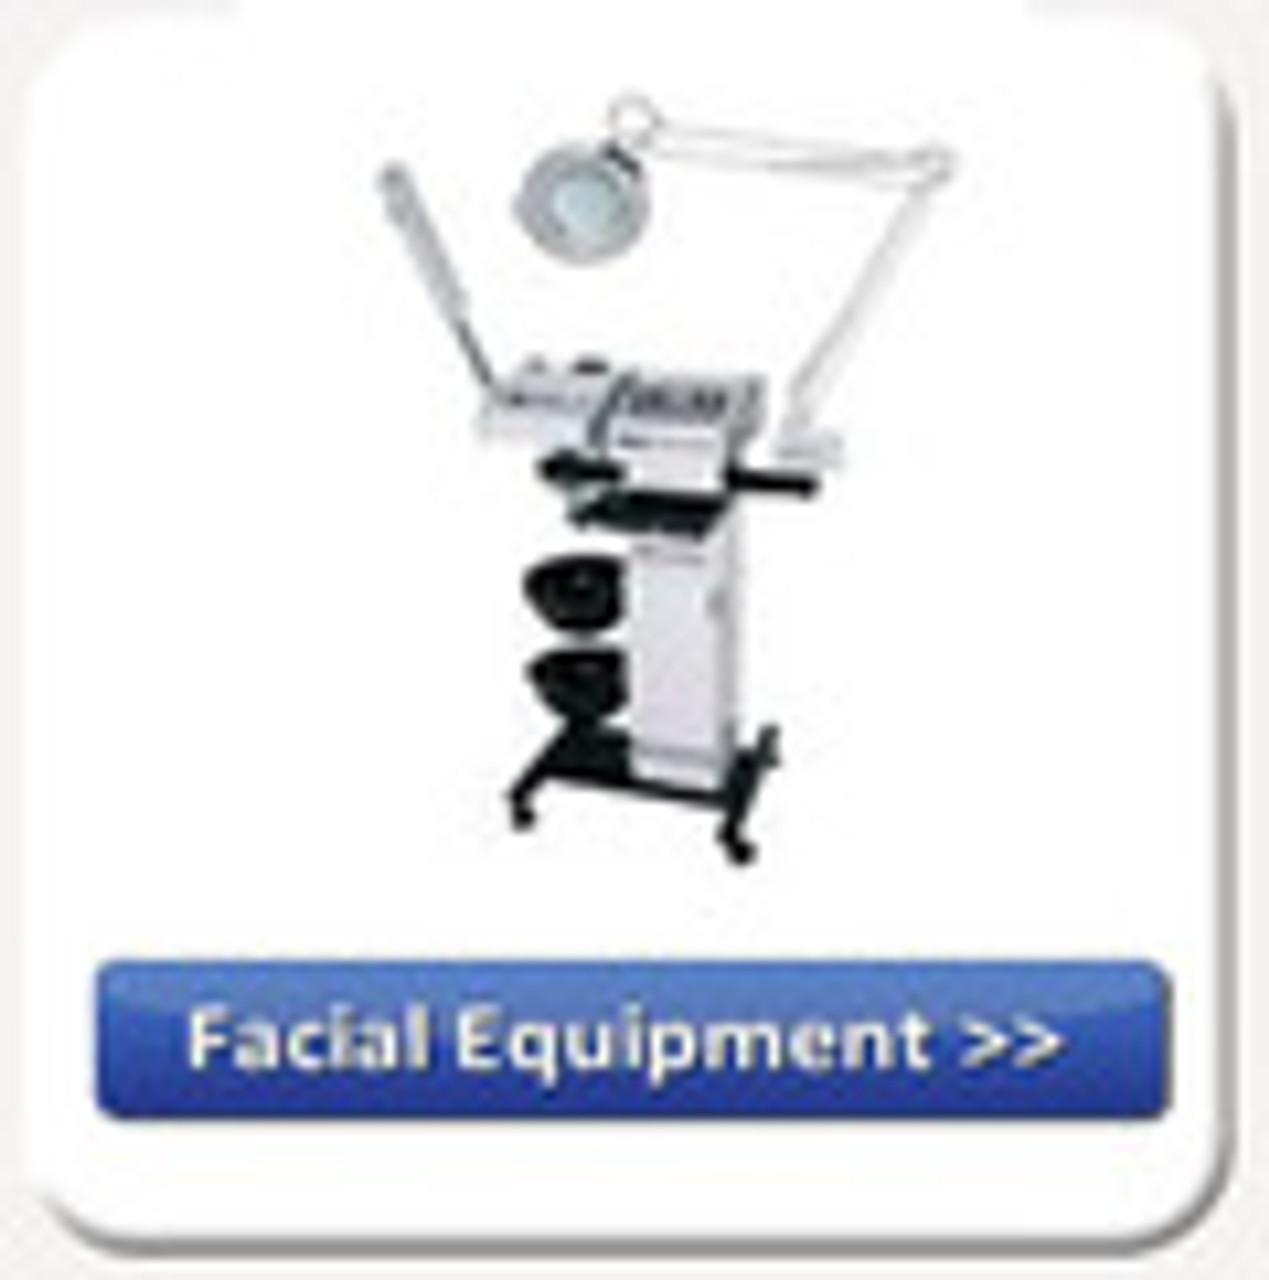 Facial Equipment